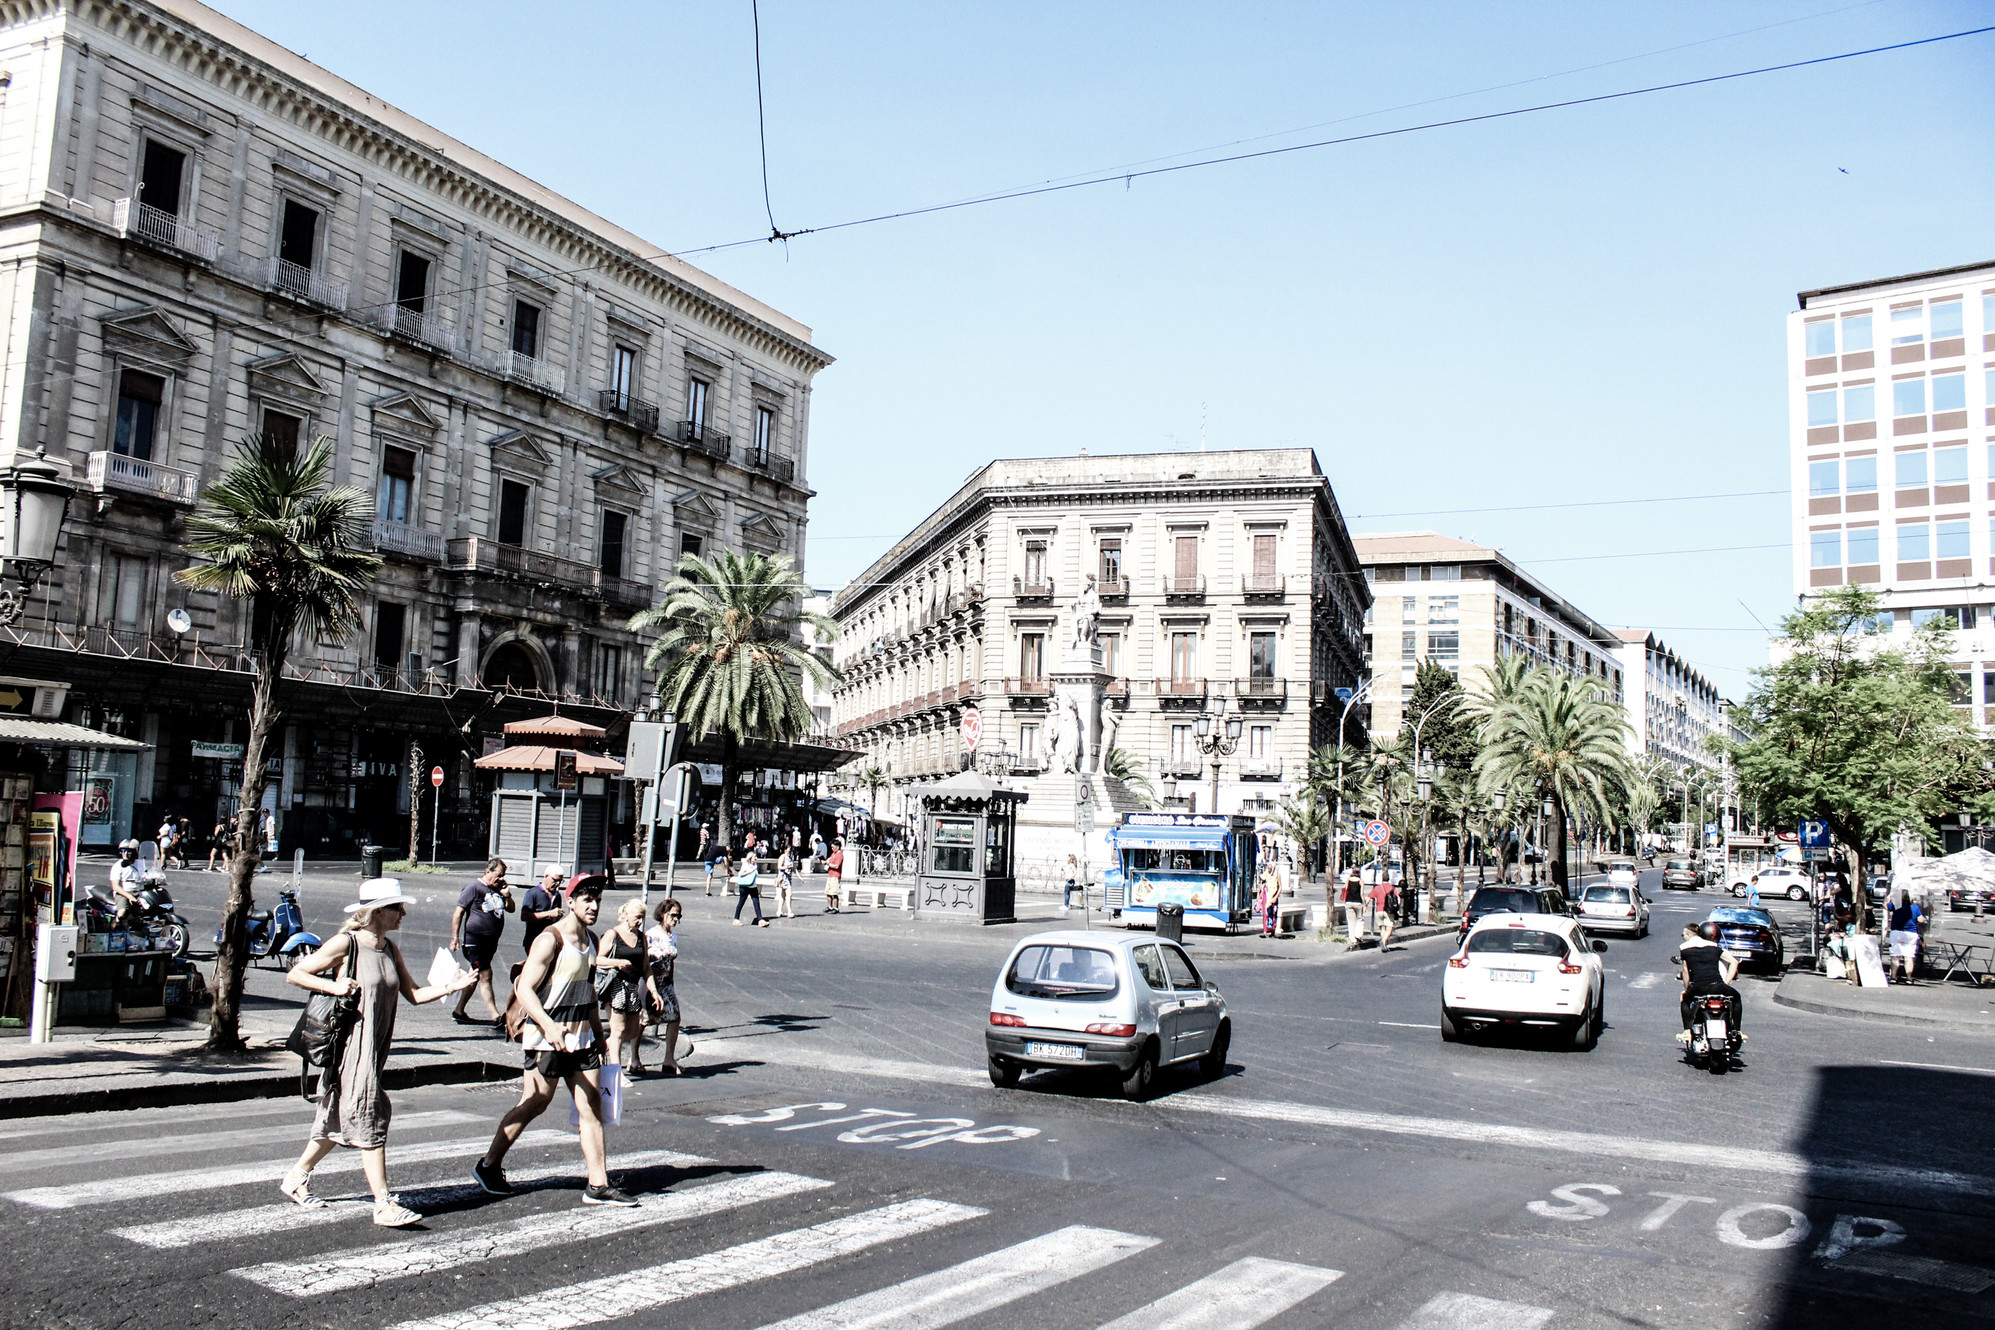 Ankunft Catania